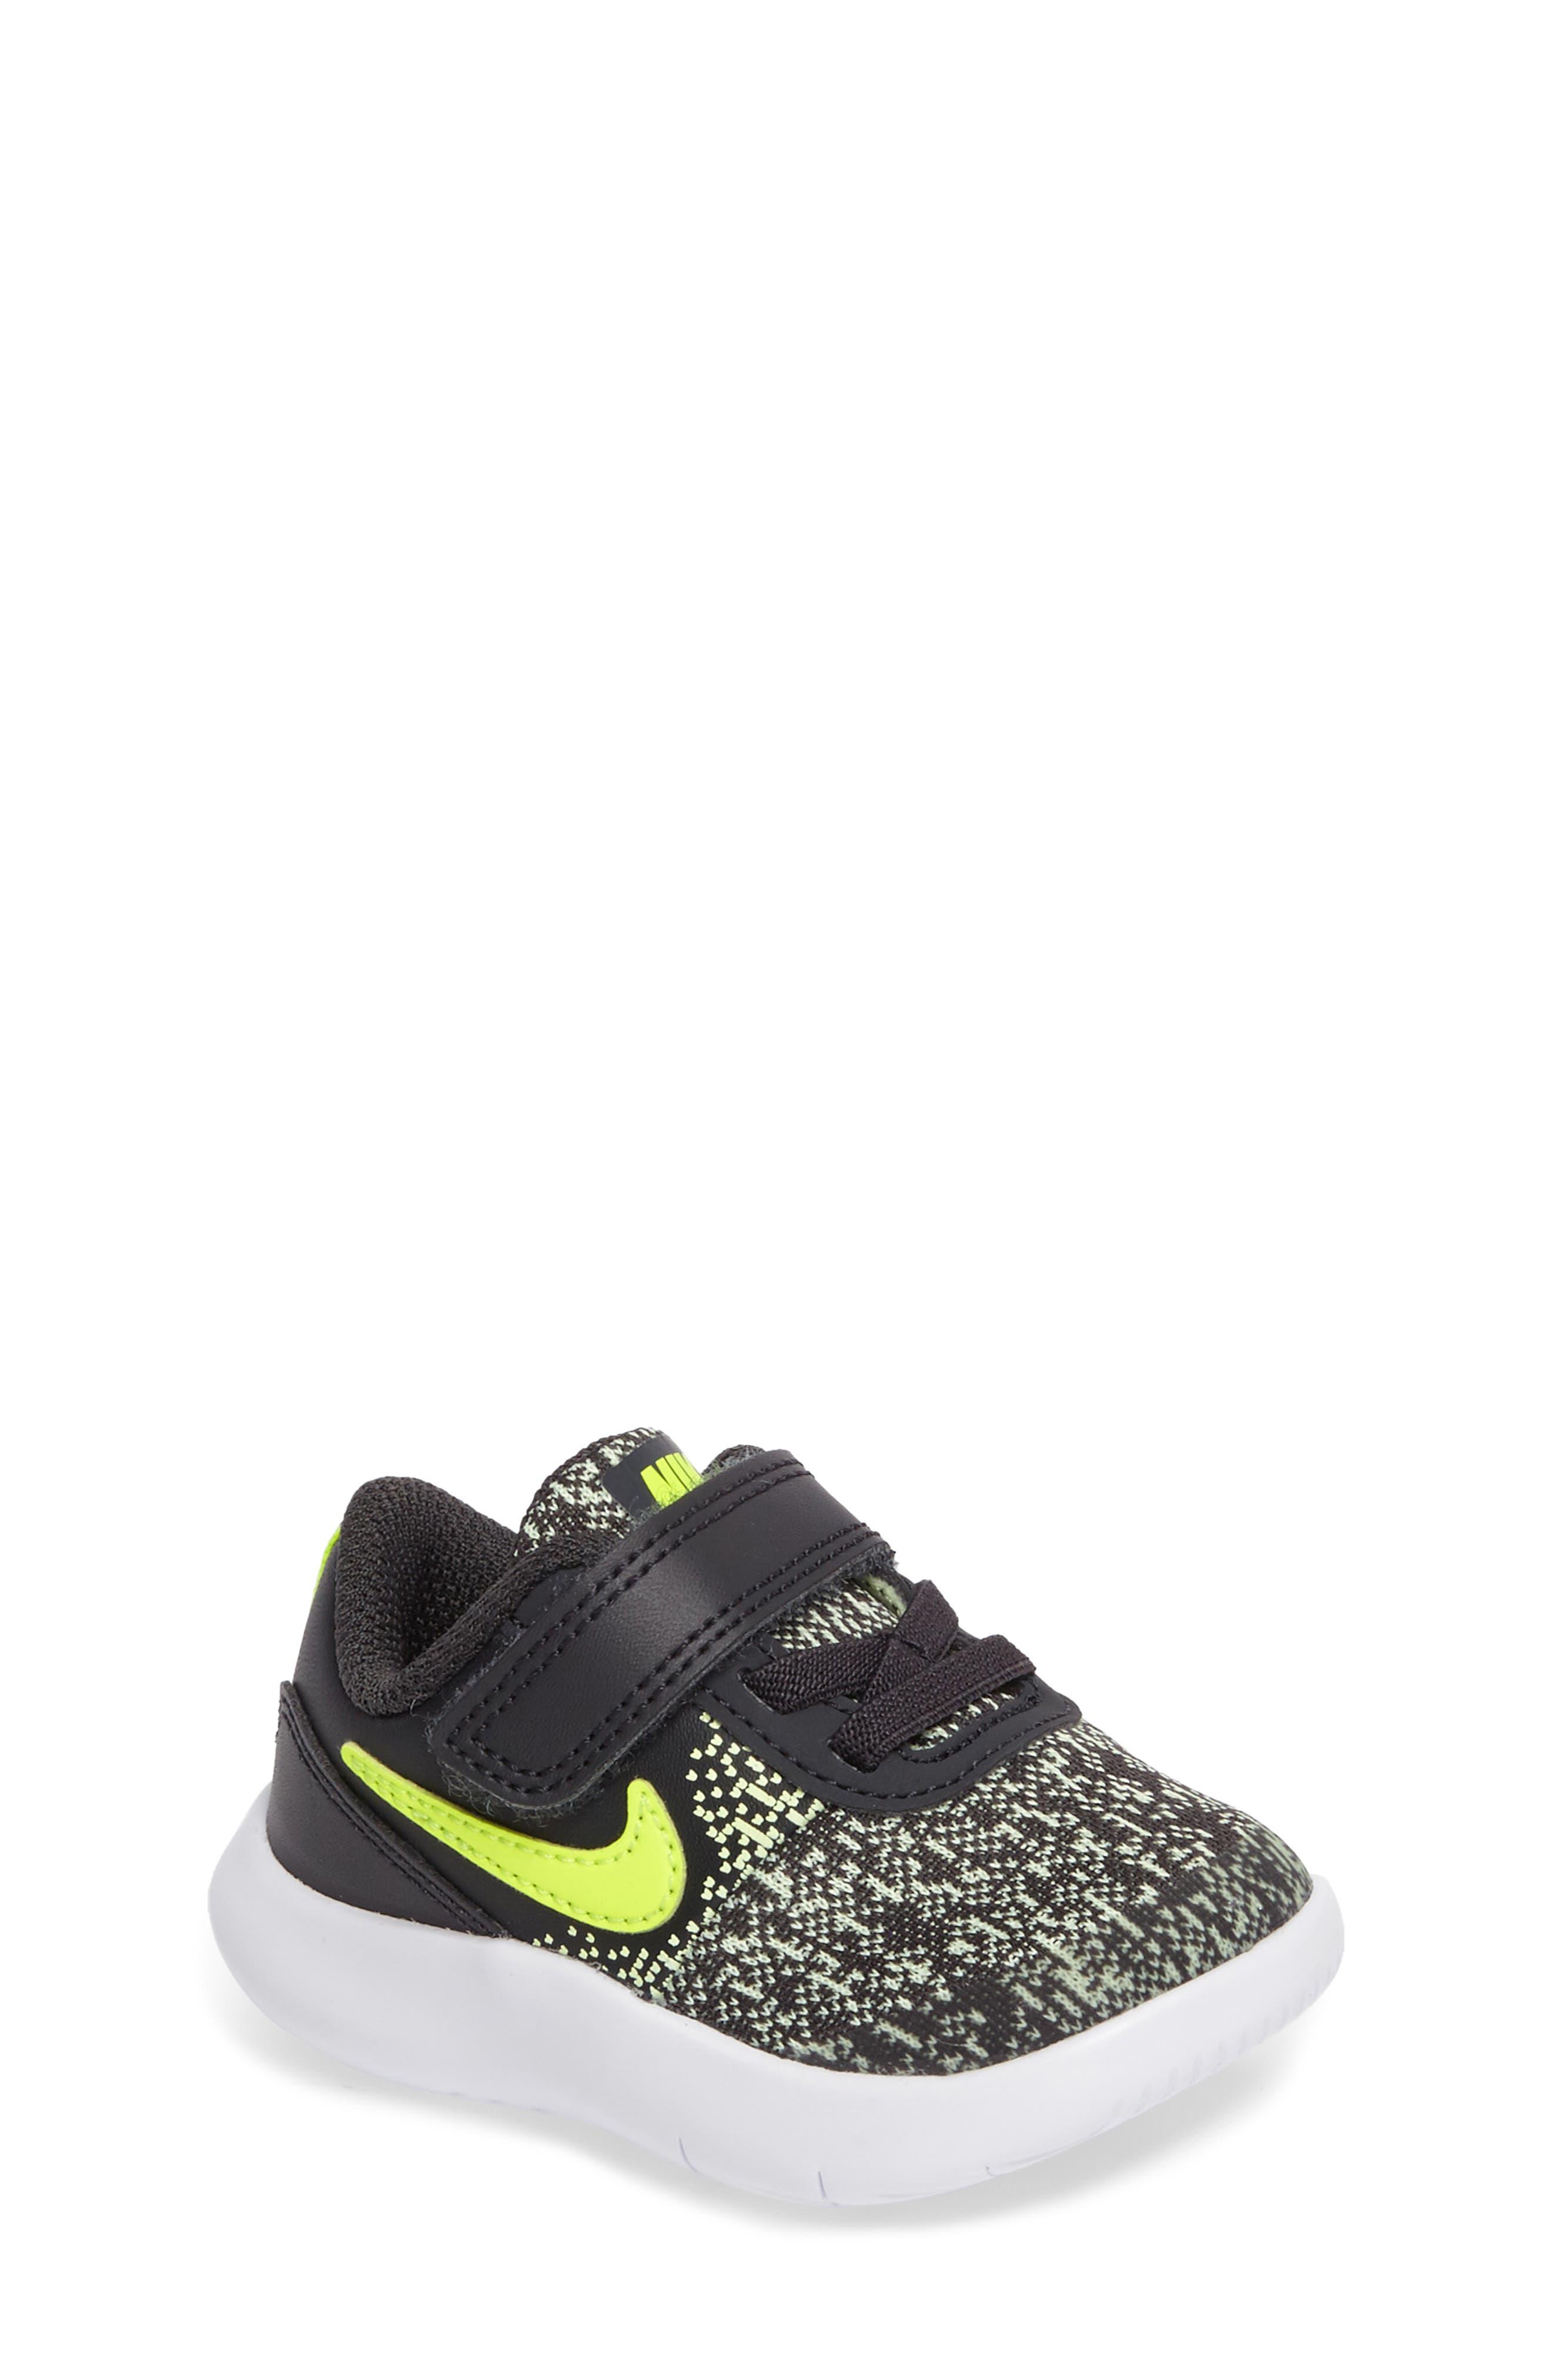 Flex Contact Sneaker,                         Main,                         color, 021